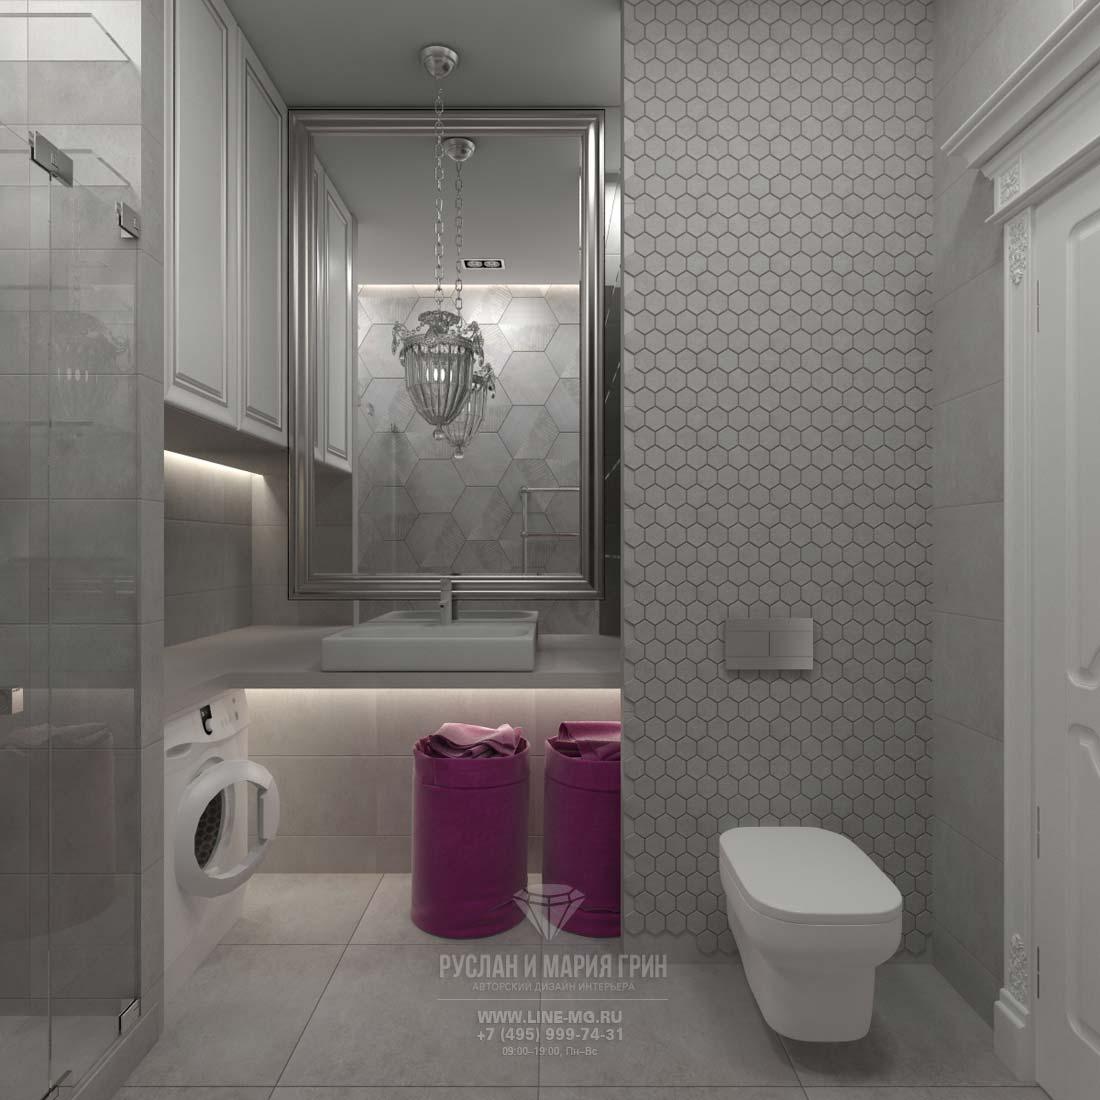 Дизайн ванной комнаты, фото 2016